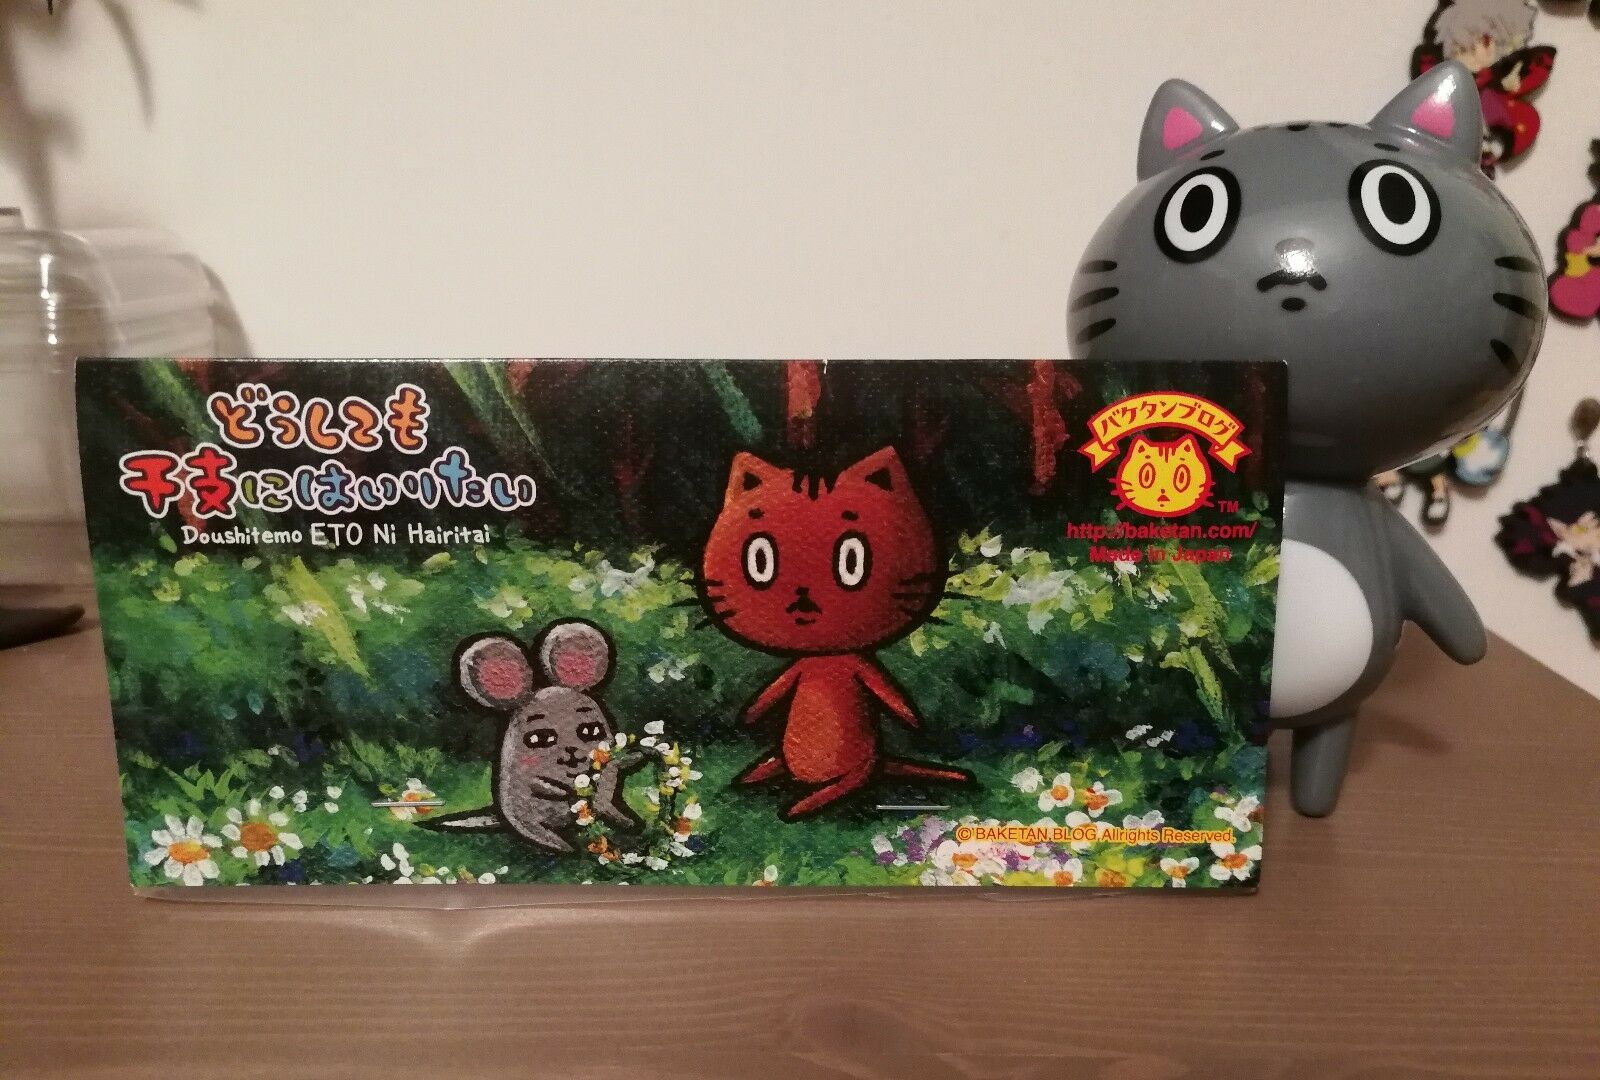 Cat   Neko Doushitemo Eto Ni Hairitai Baketan Blog Soft Vinyl Sofubi Figure